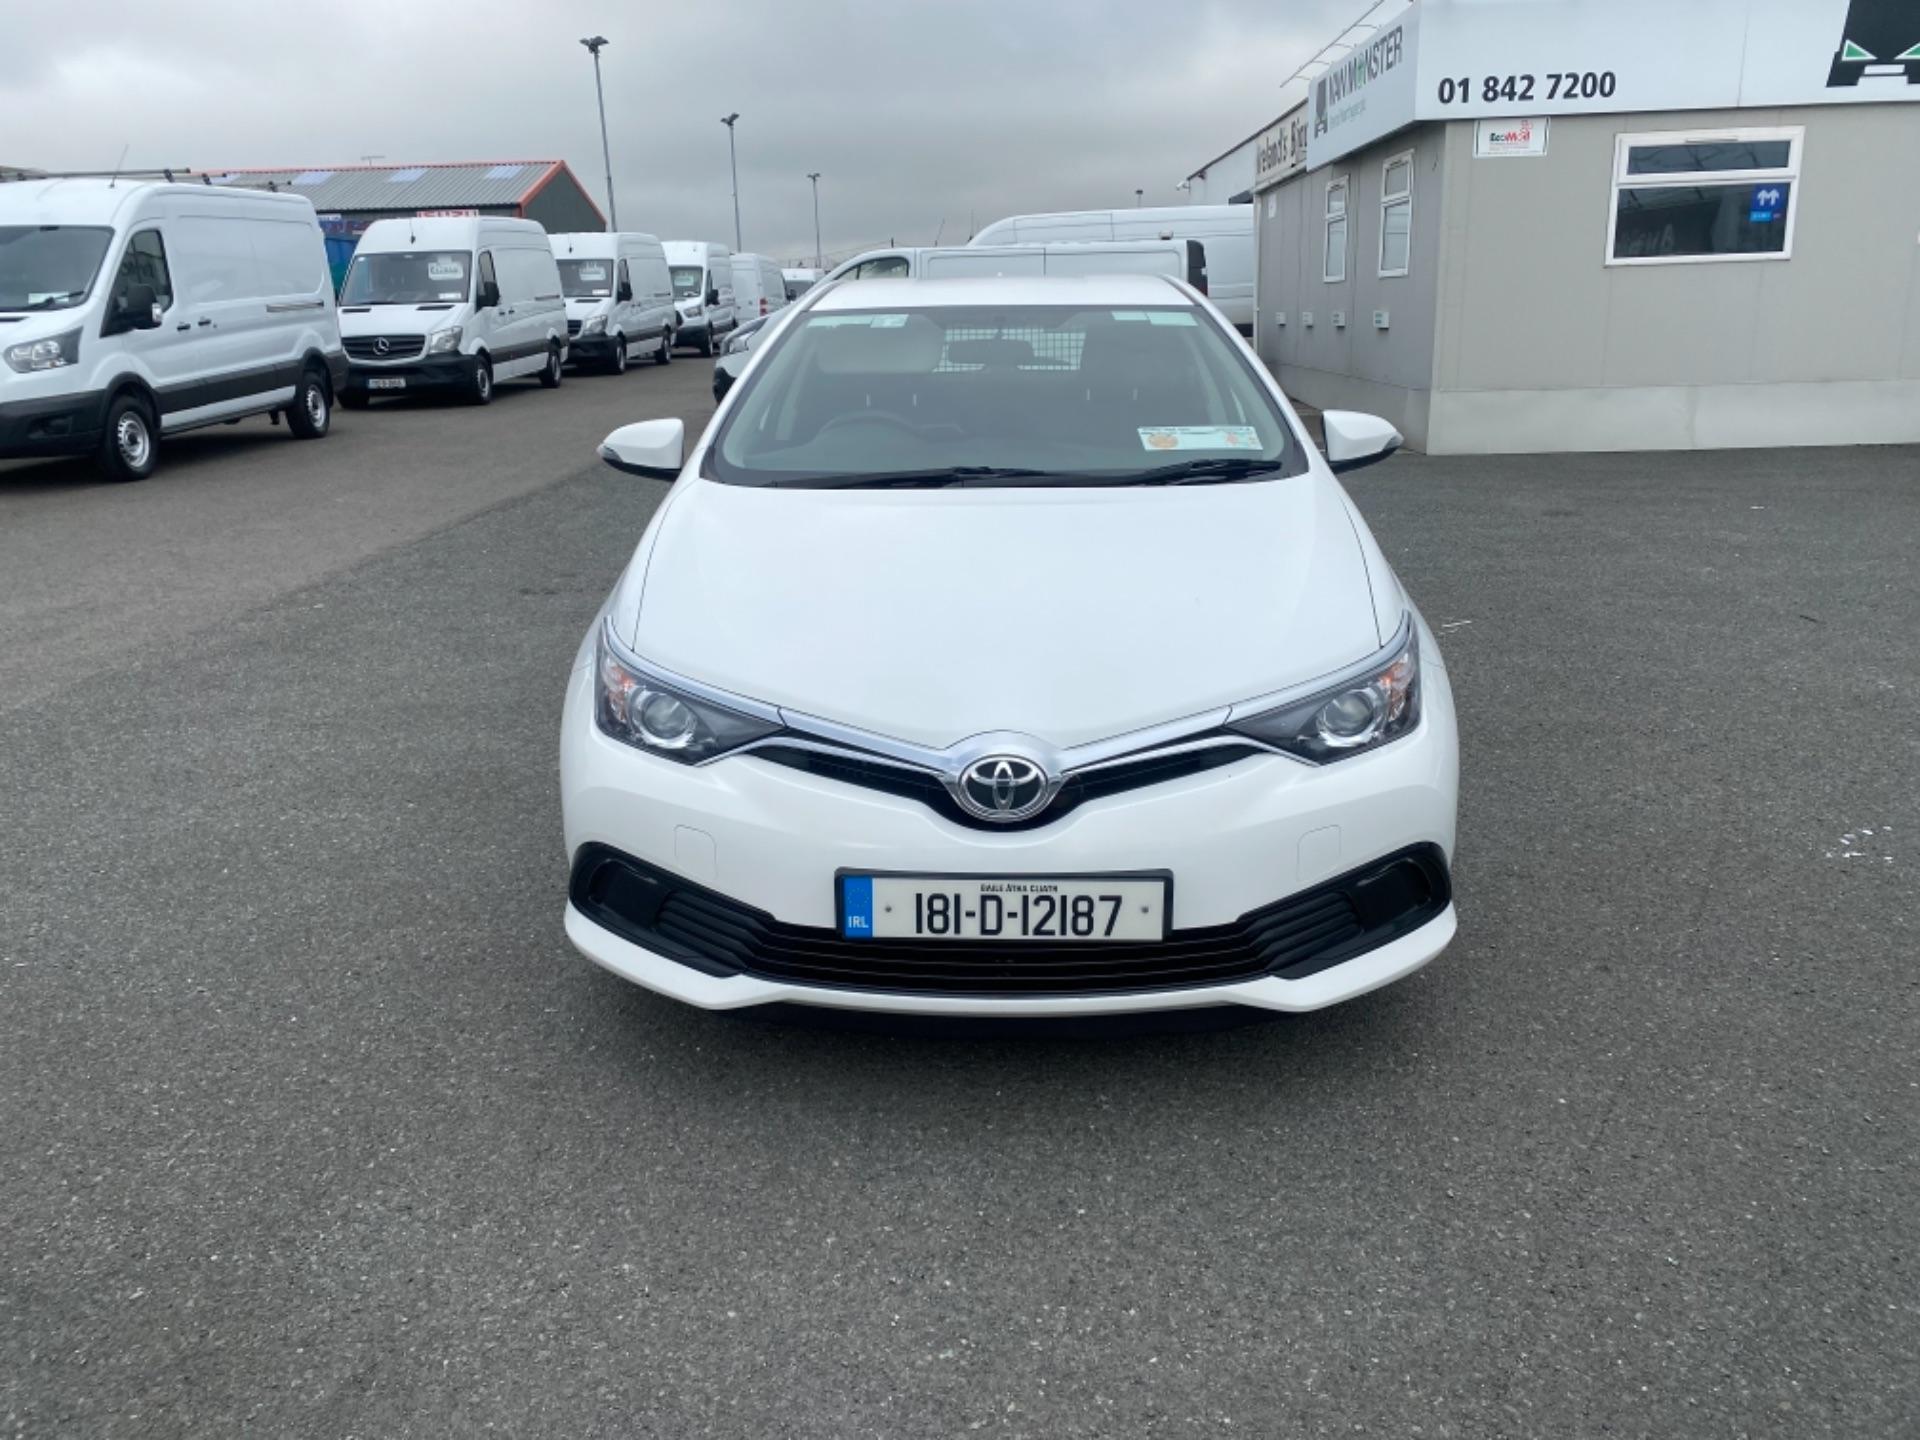 2018 Toyota Auris VAN 1.4 D4D Terra 4DR (181D12187)